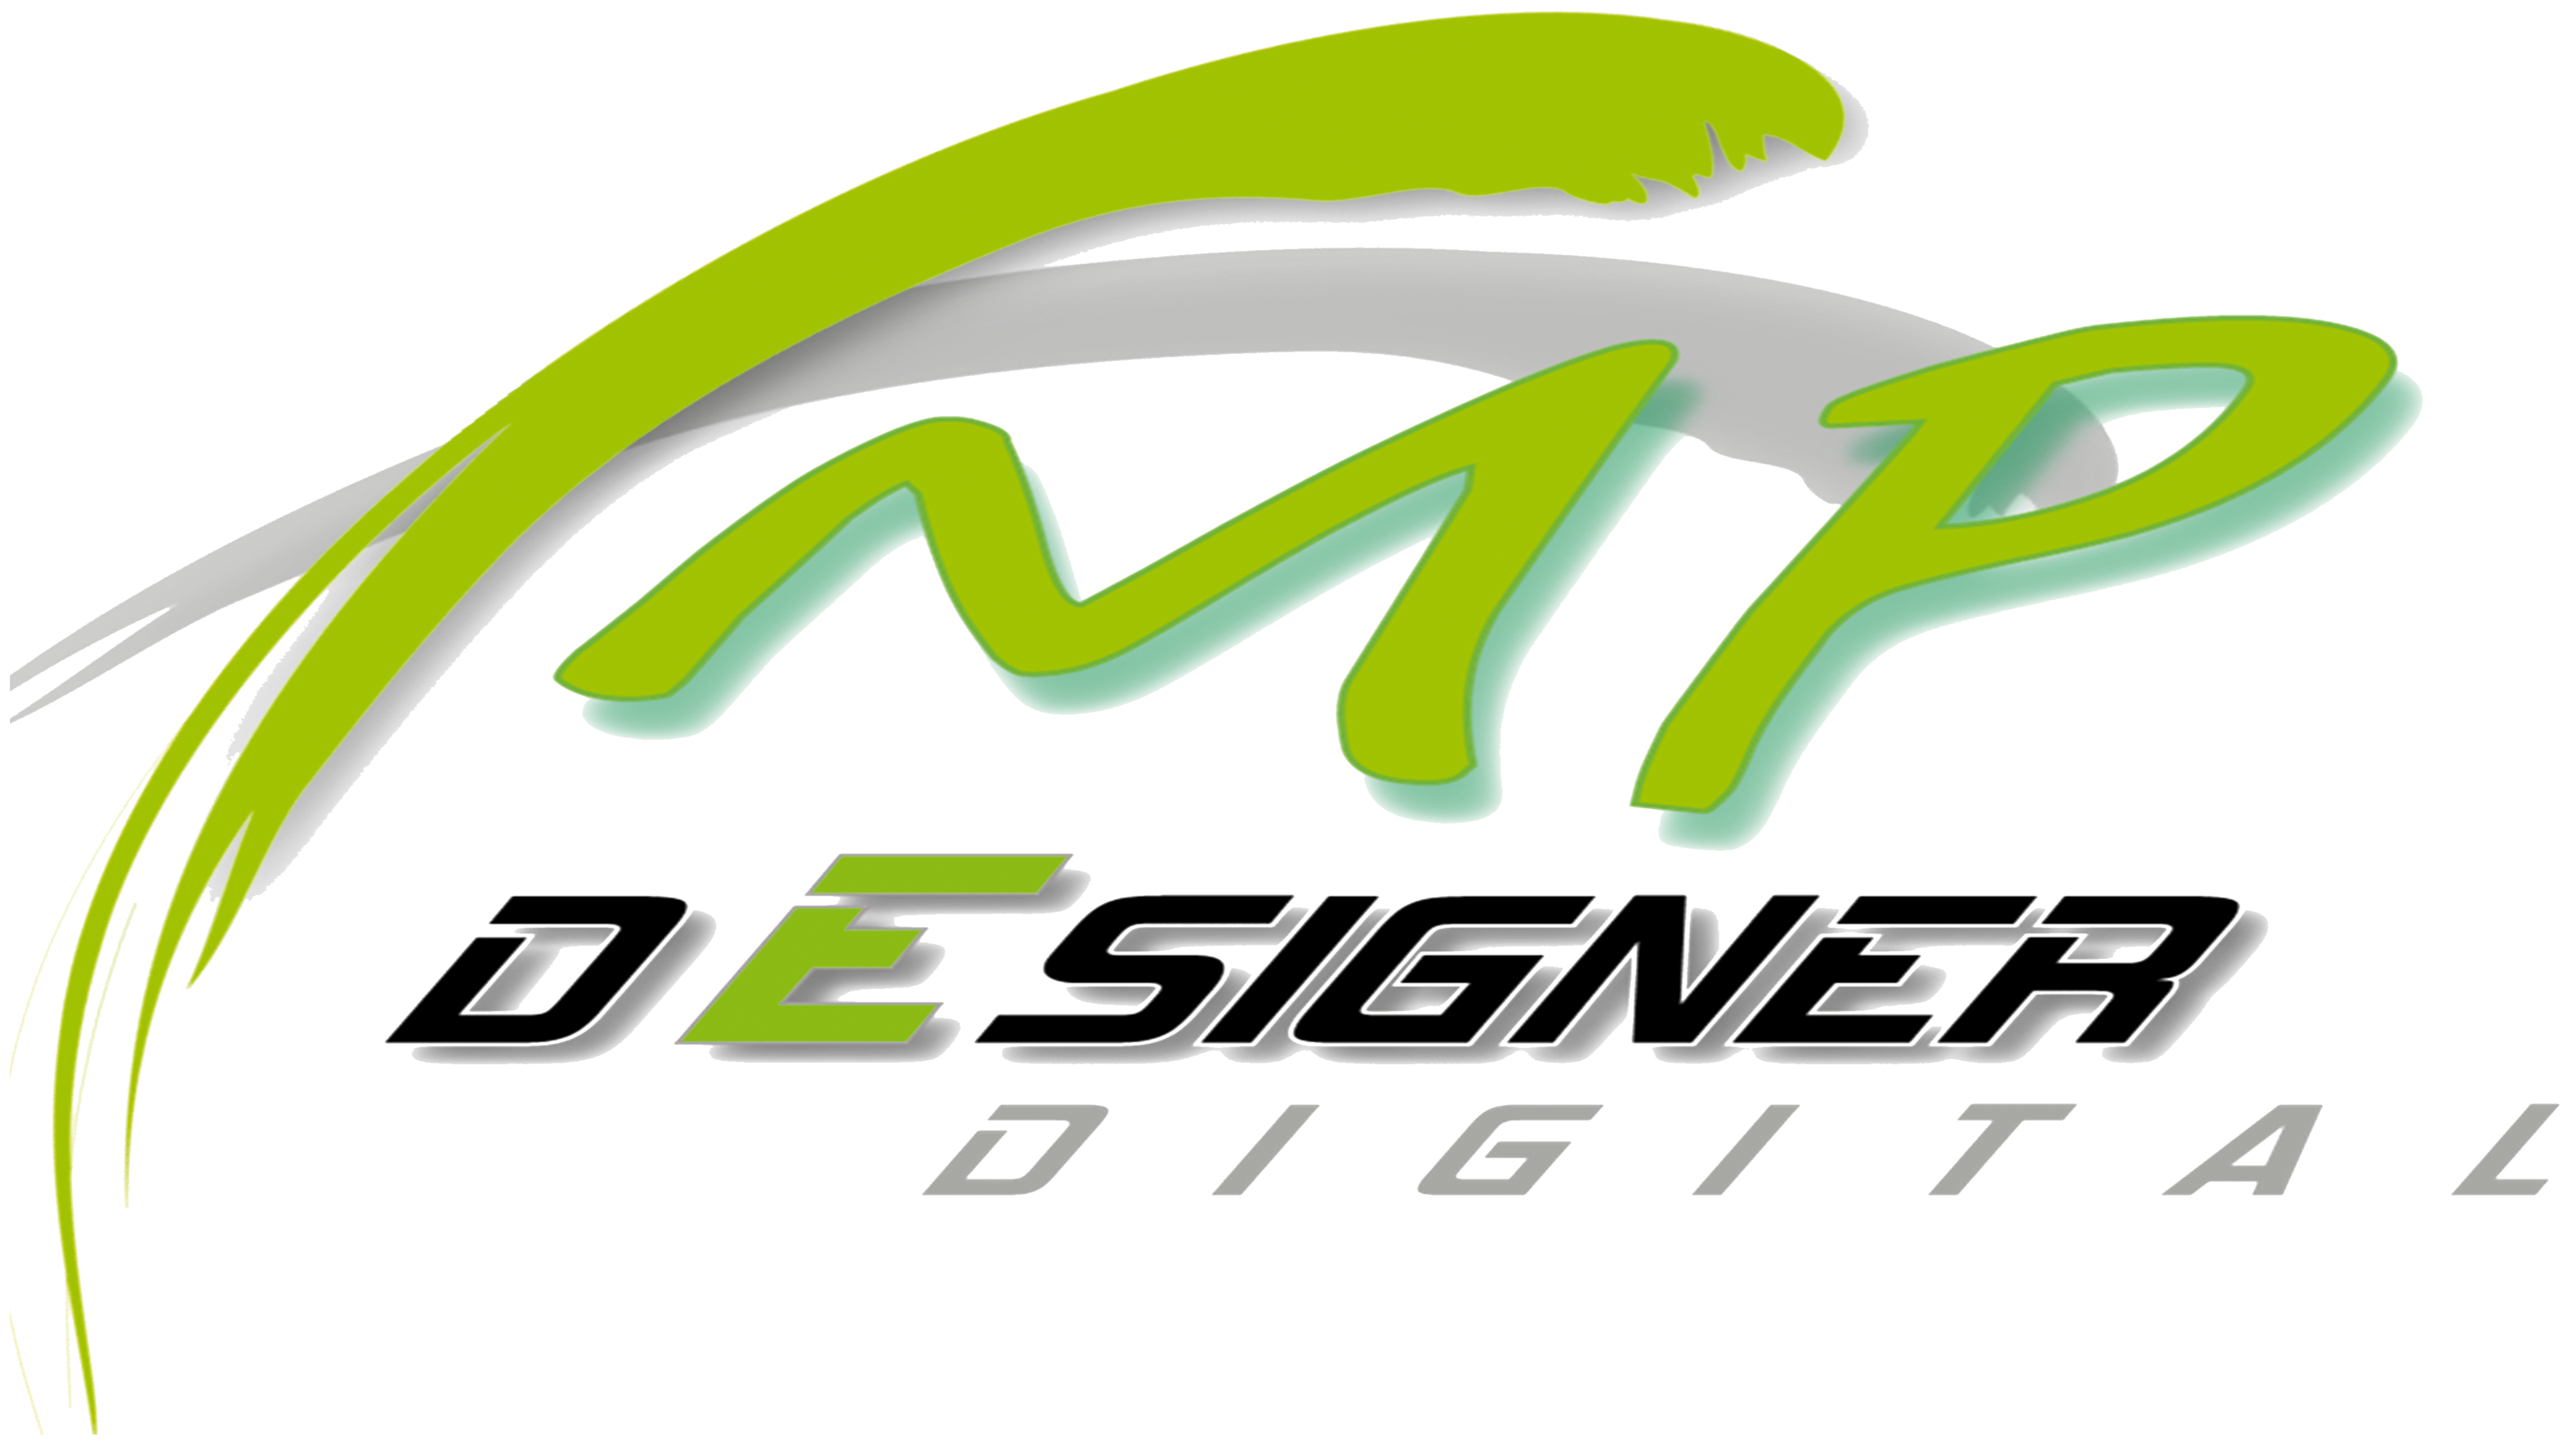 mp_designer_digital